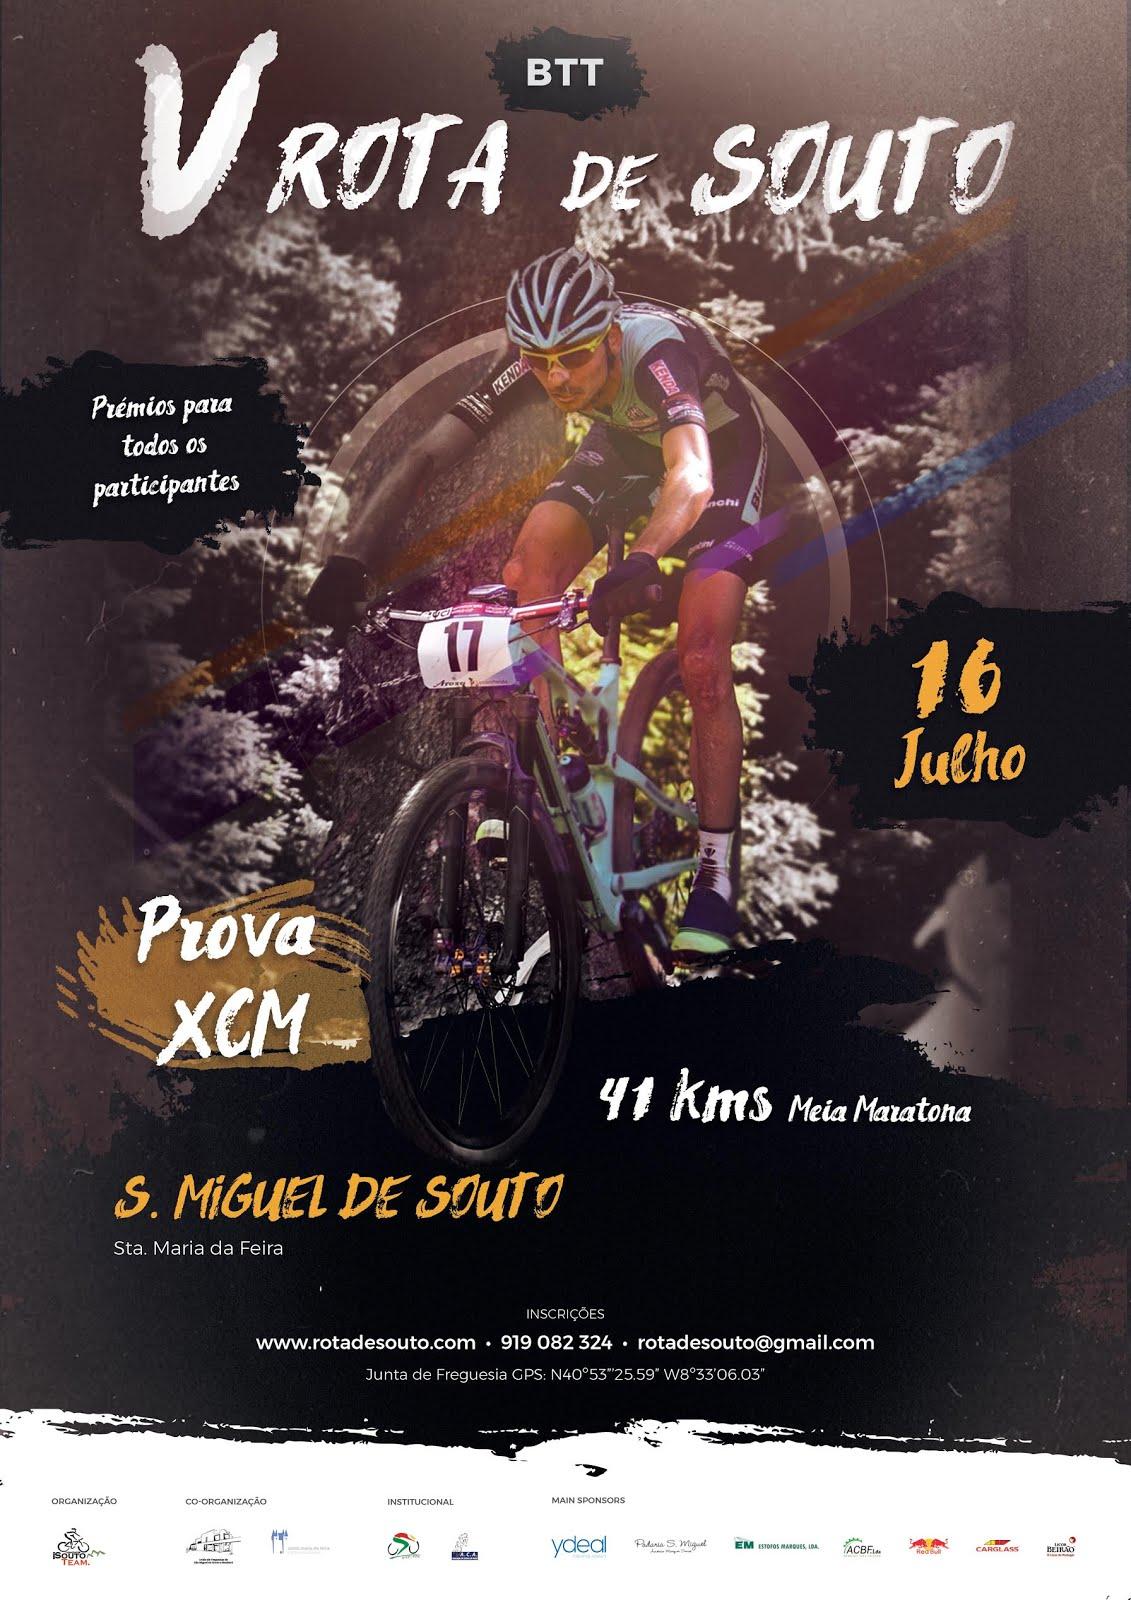 16JUL * S. MIGUEL DE SOUTO - STA. MARIA DA FEIRA